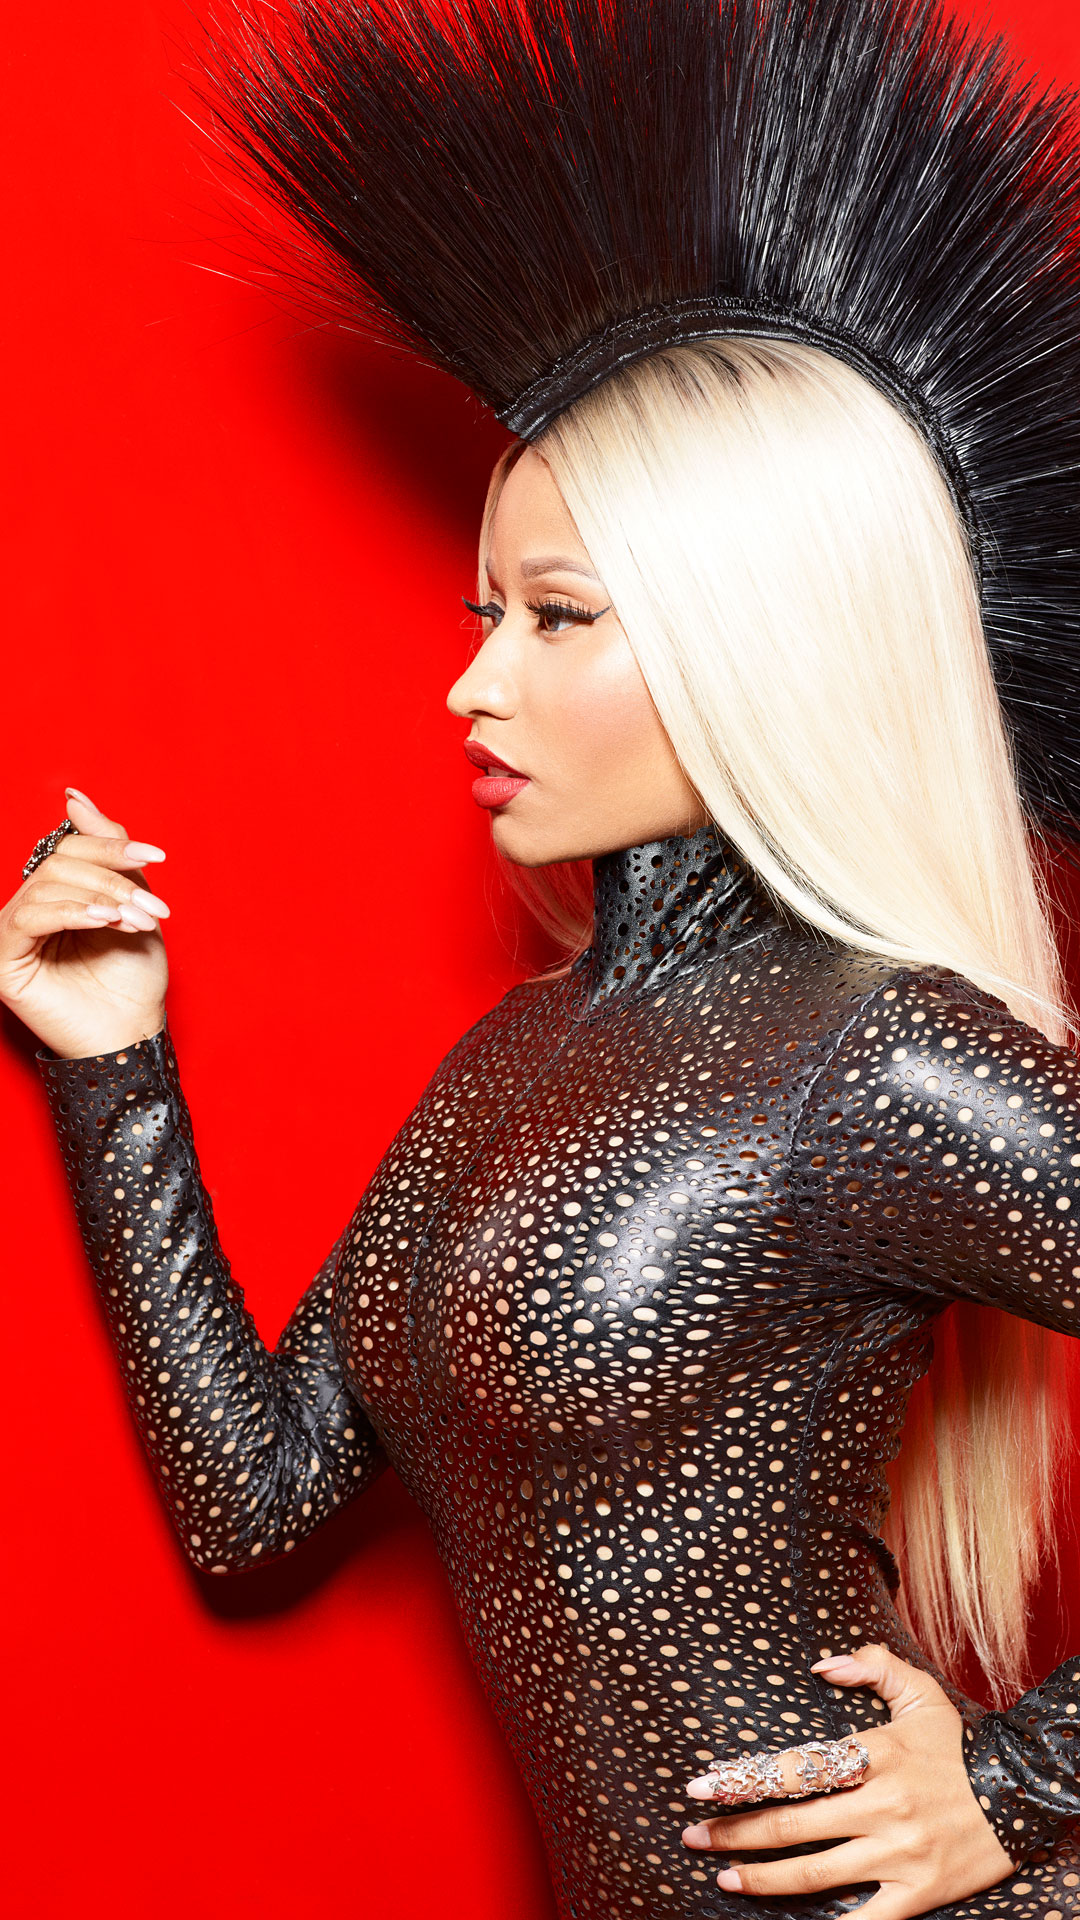 Nicki Minaj Pictures Nicki Minaj Fashion Photo Shoot